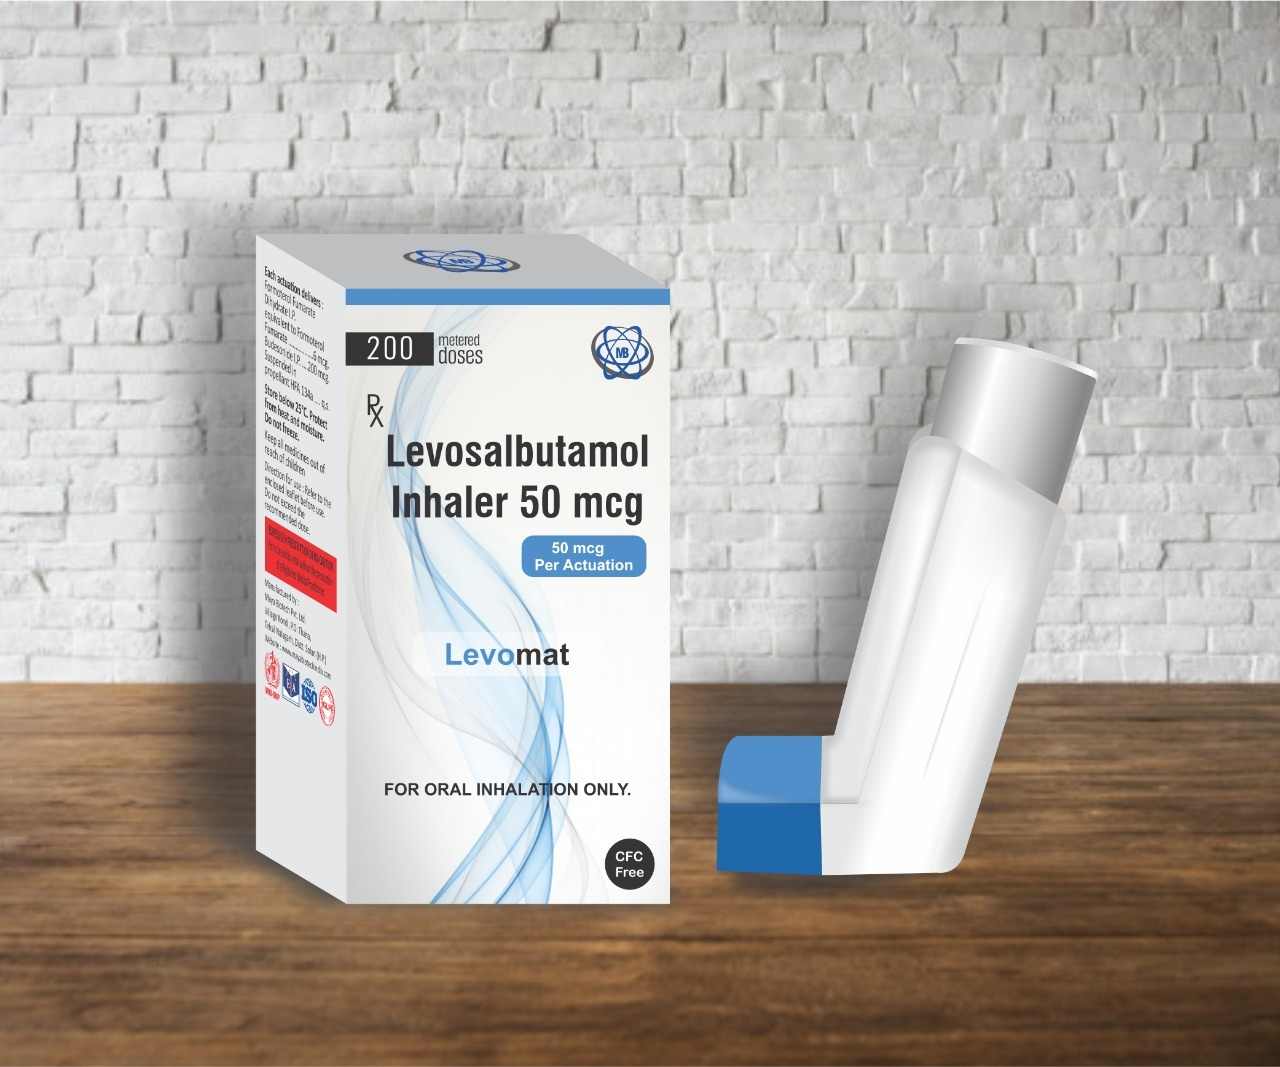 Mometasone Aqueous Nasal Spray I.p.50 Mcg(Moment Nasal Spray)